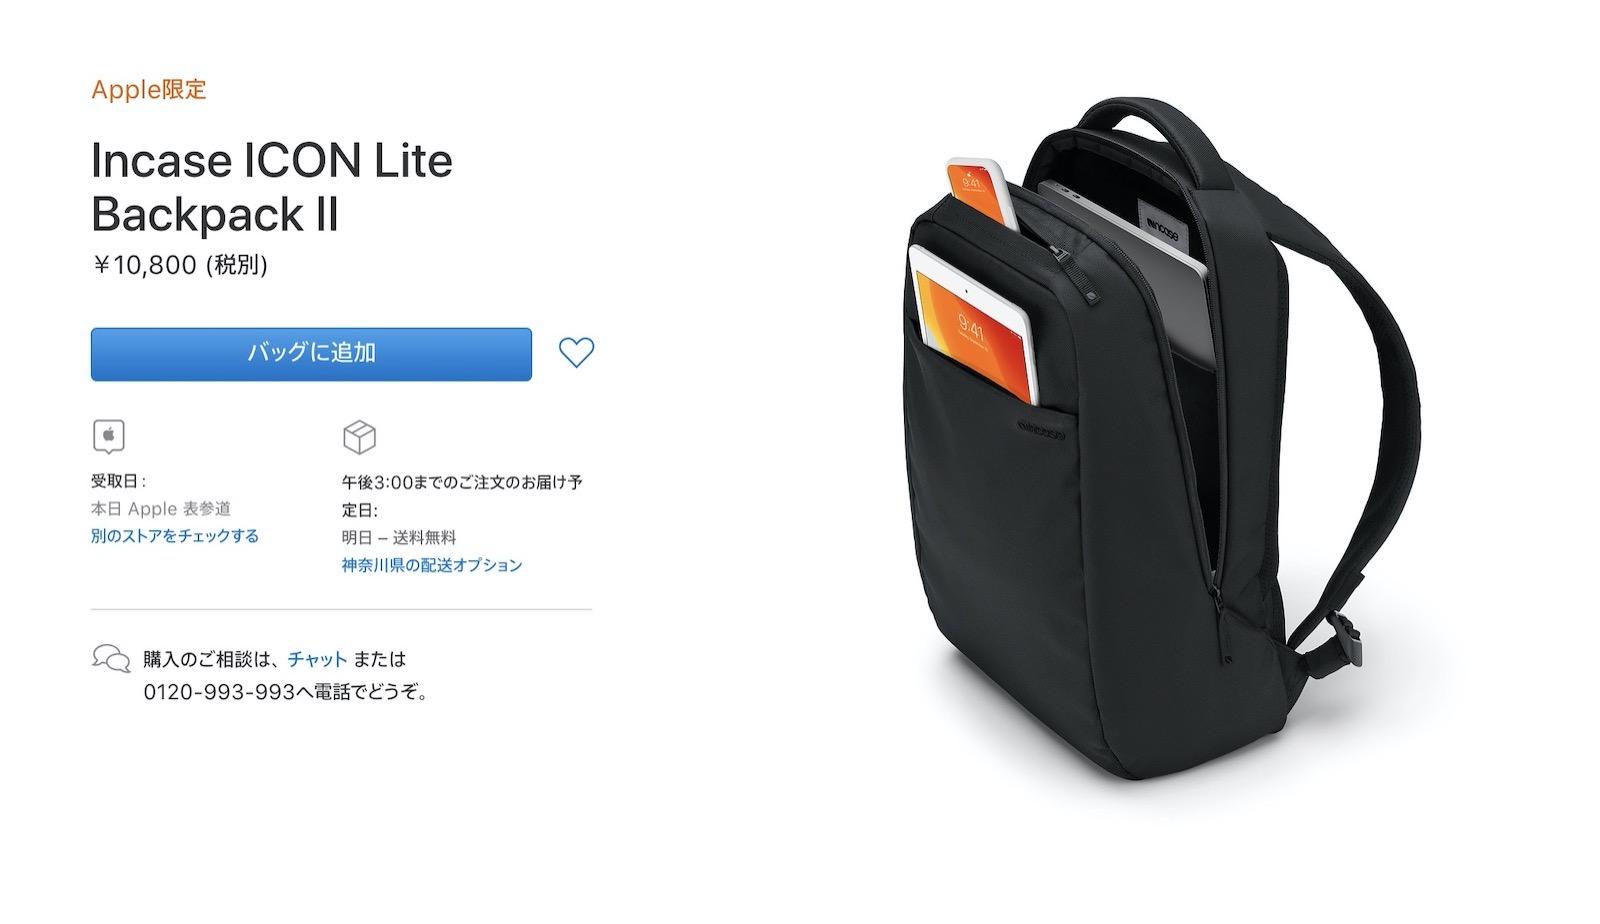 incase-icon-lite-backpack-ii-1.jpg